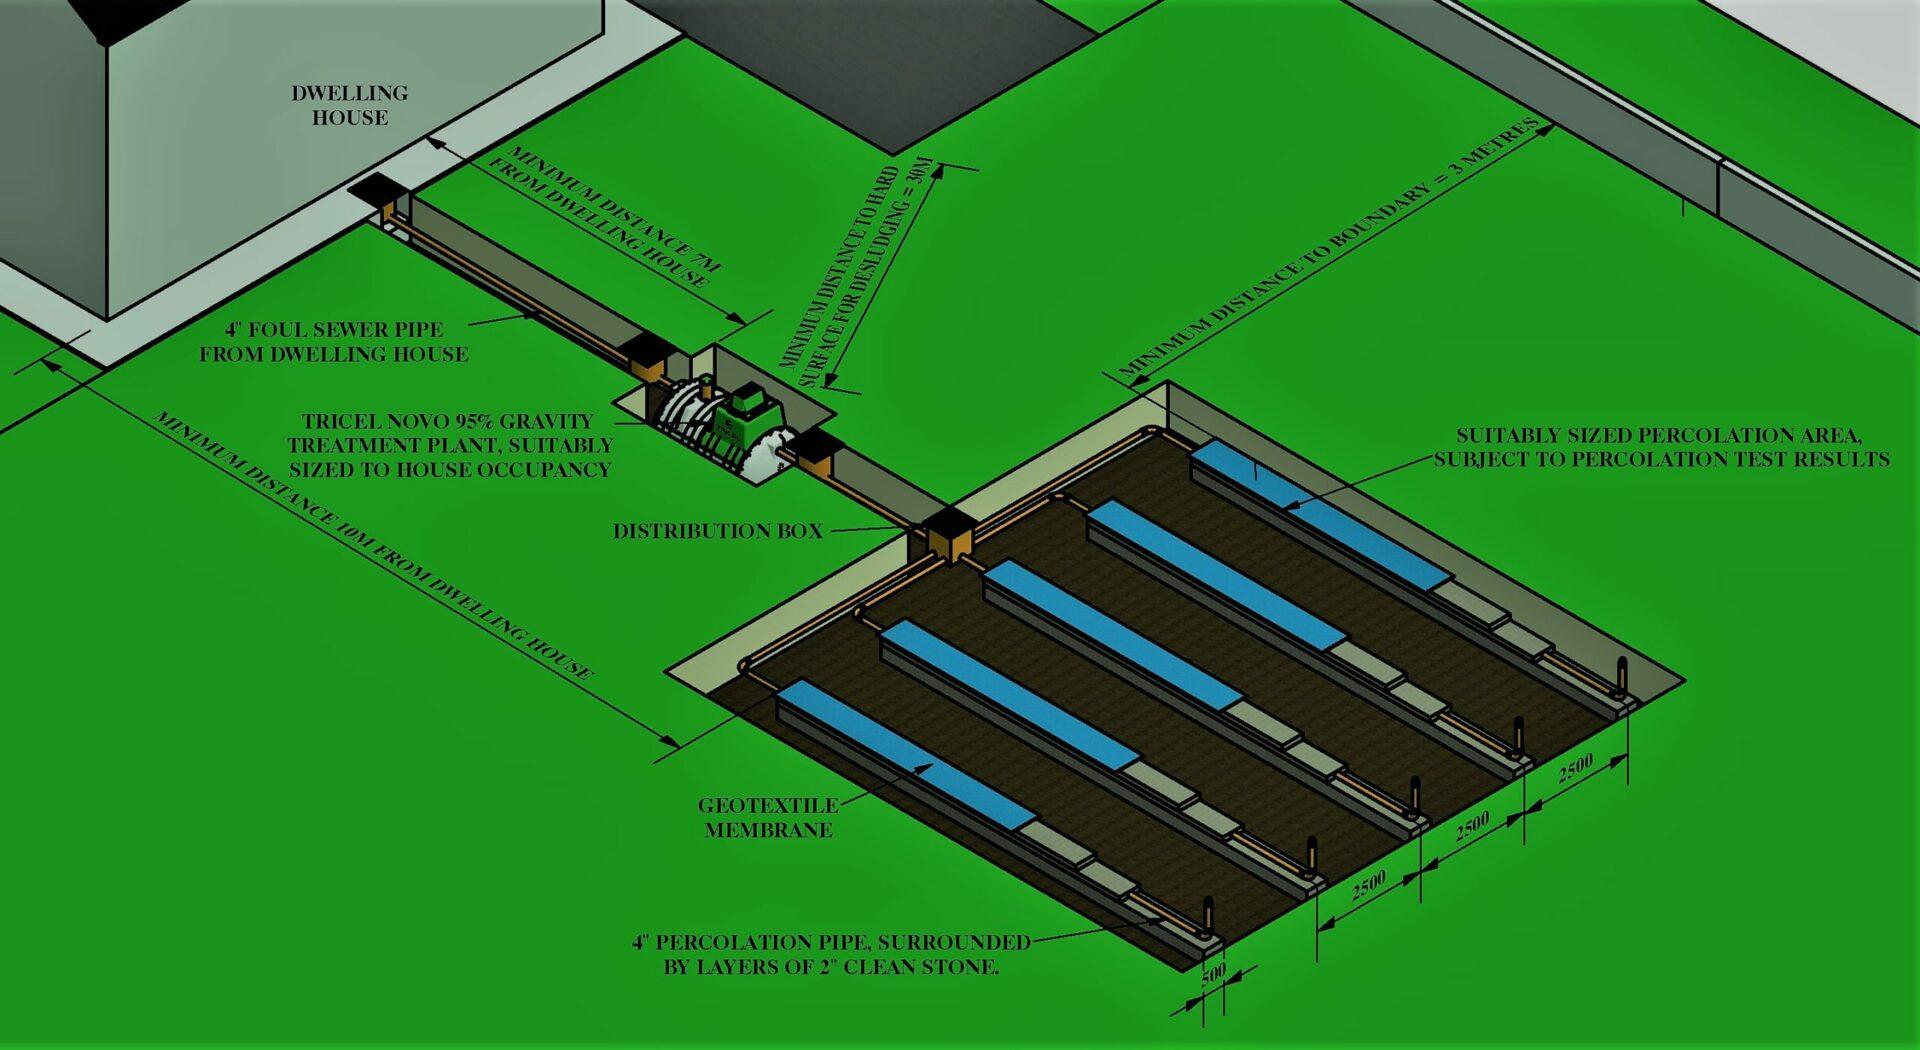 Tricel Novo Gravity Tank To Percolation Area